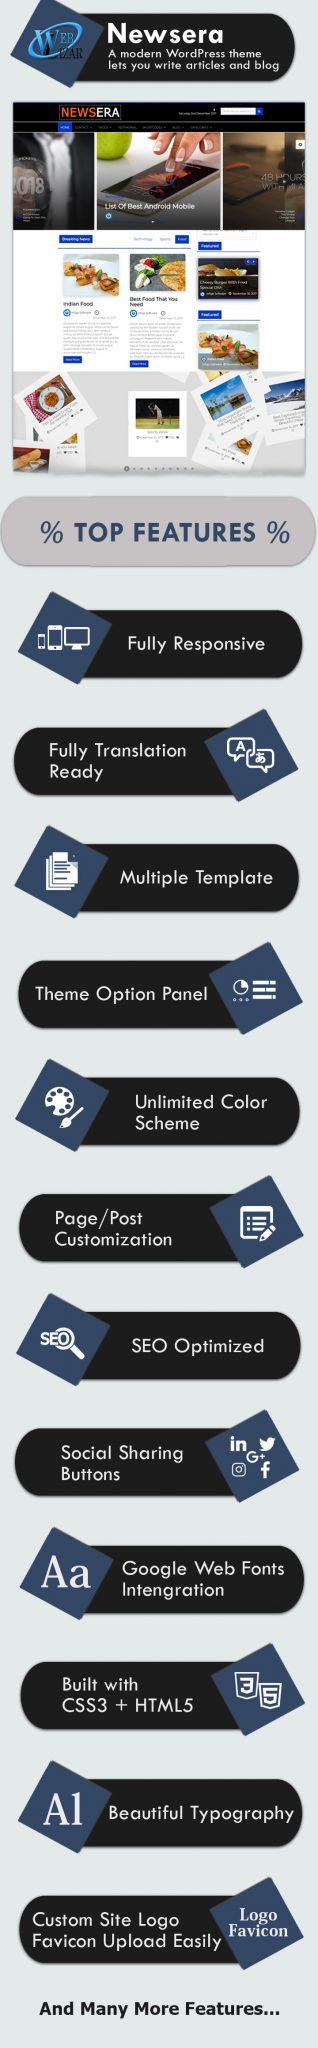 Newsera Premium WordPress Theme - Weblizar Themes